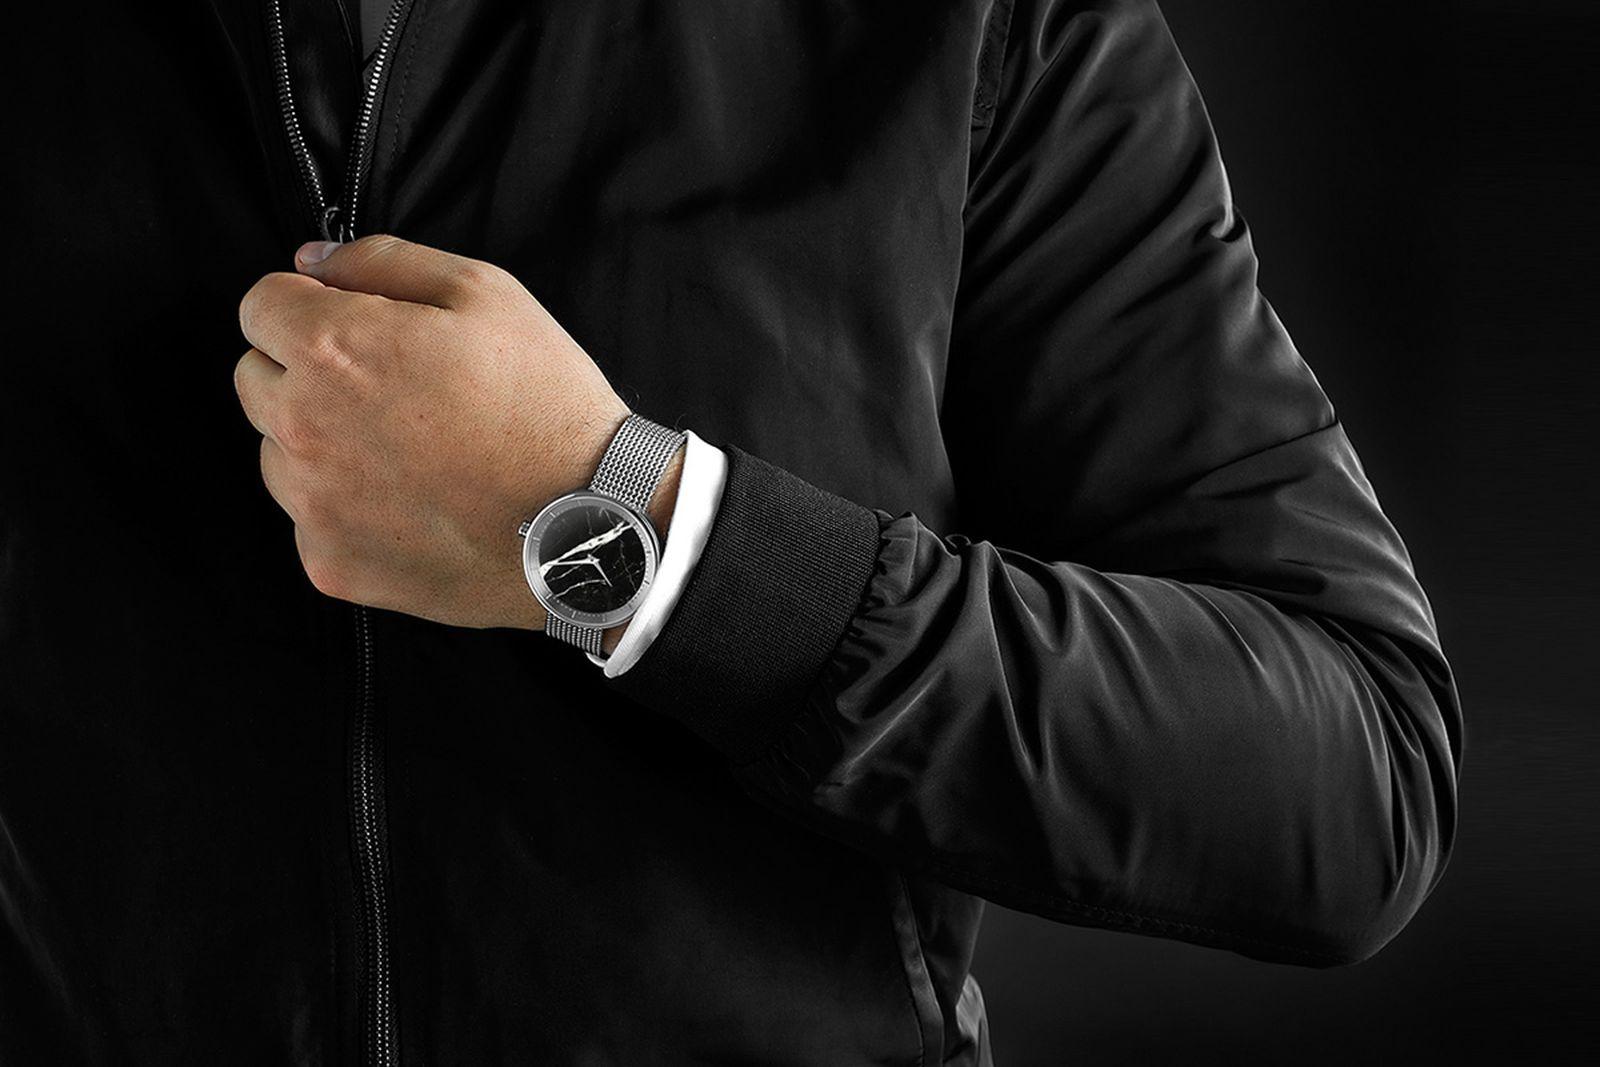 roxxlyn-tech-accessories-collection-02